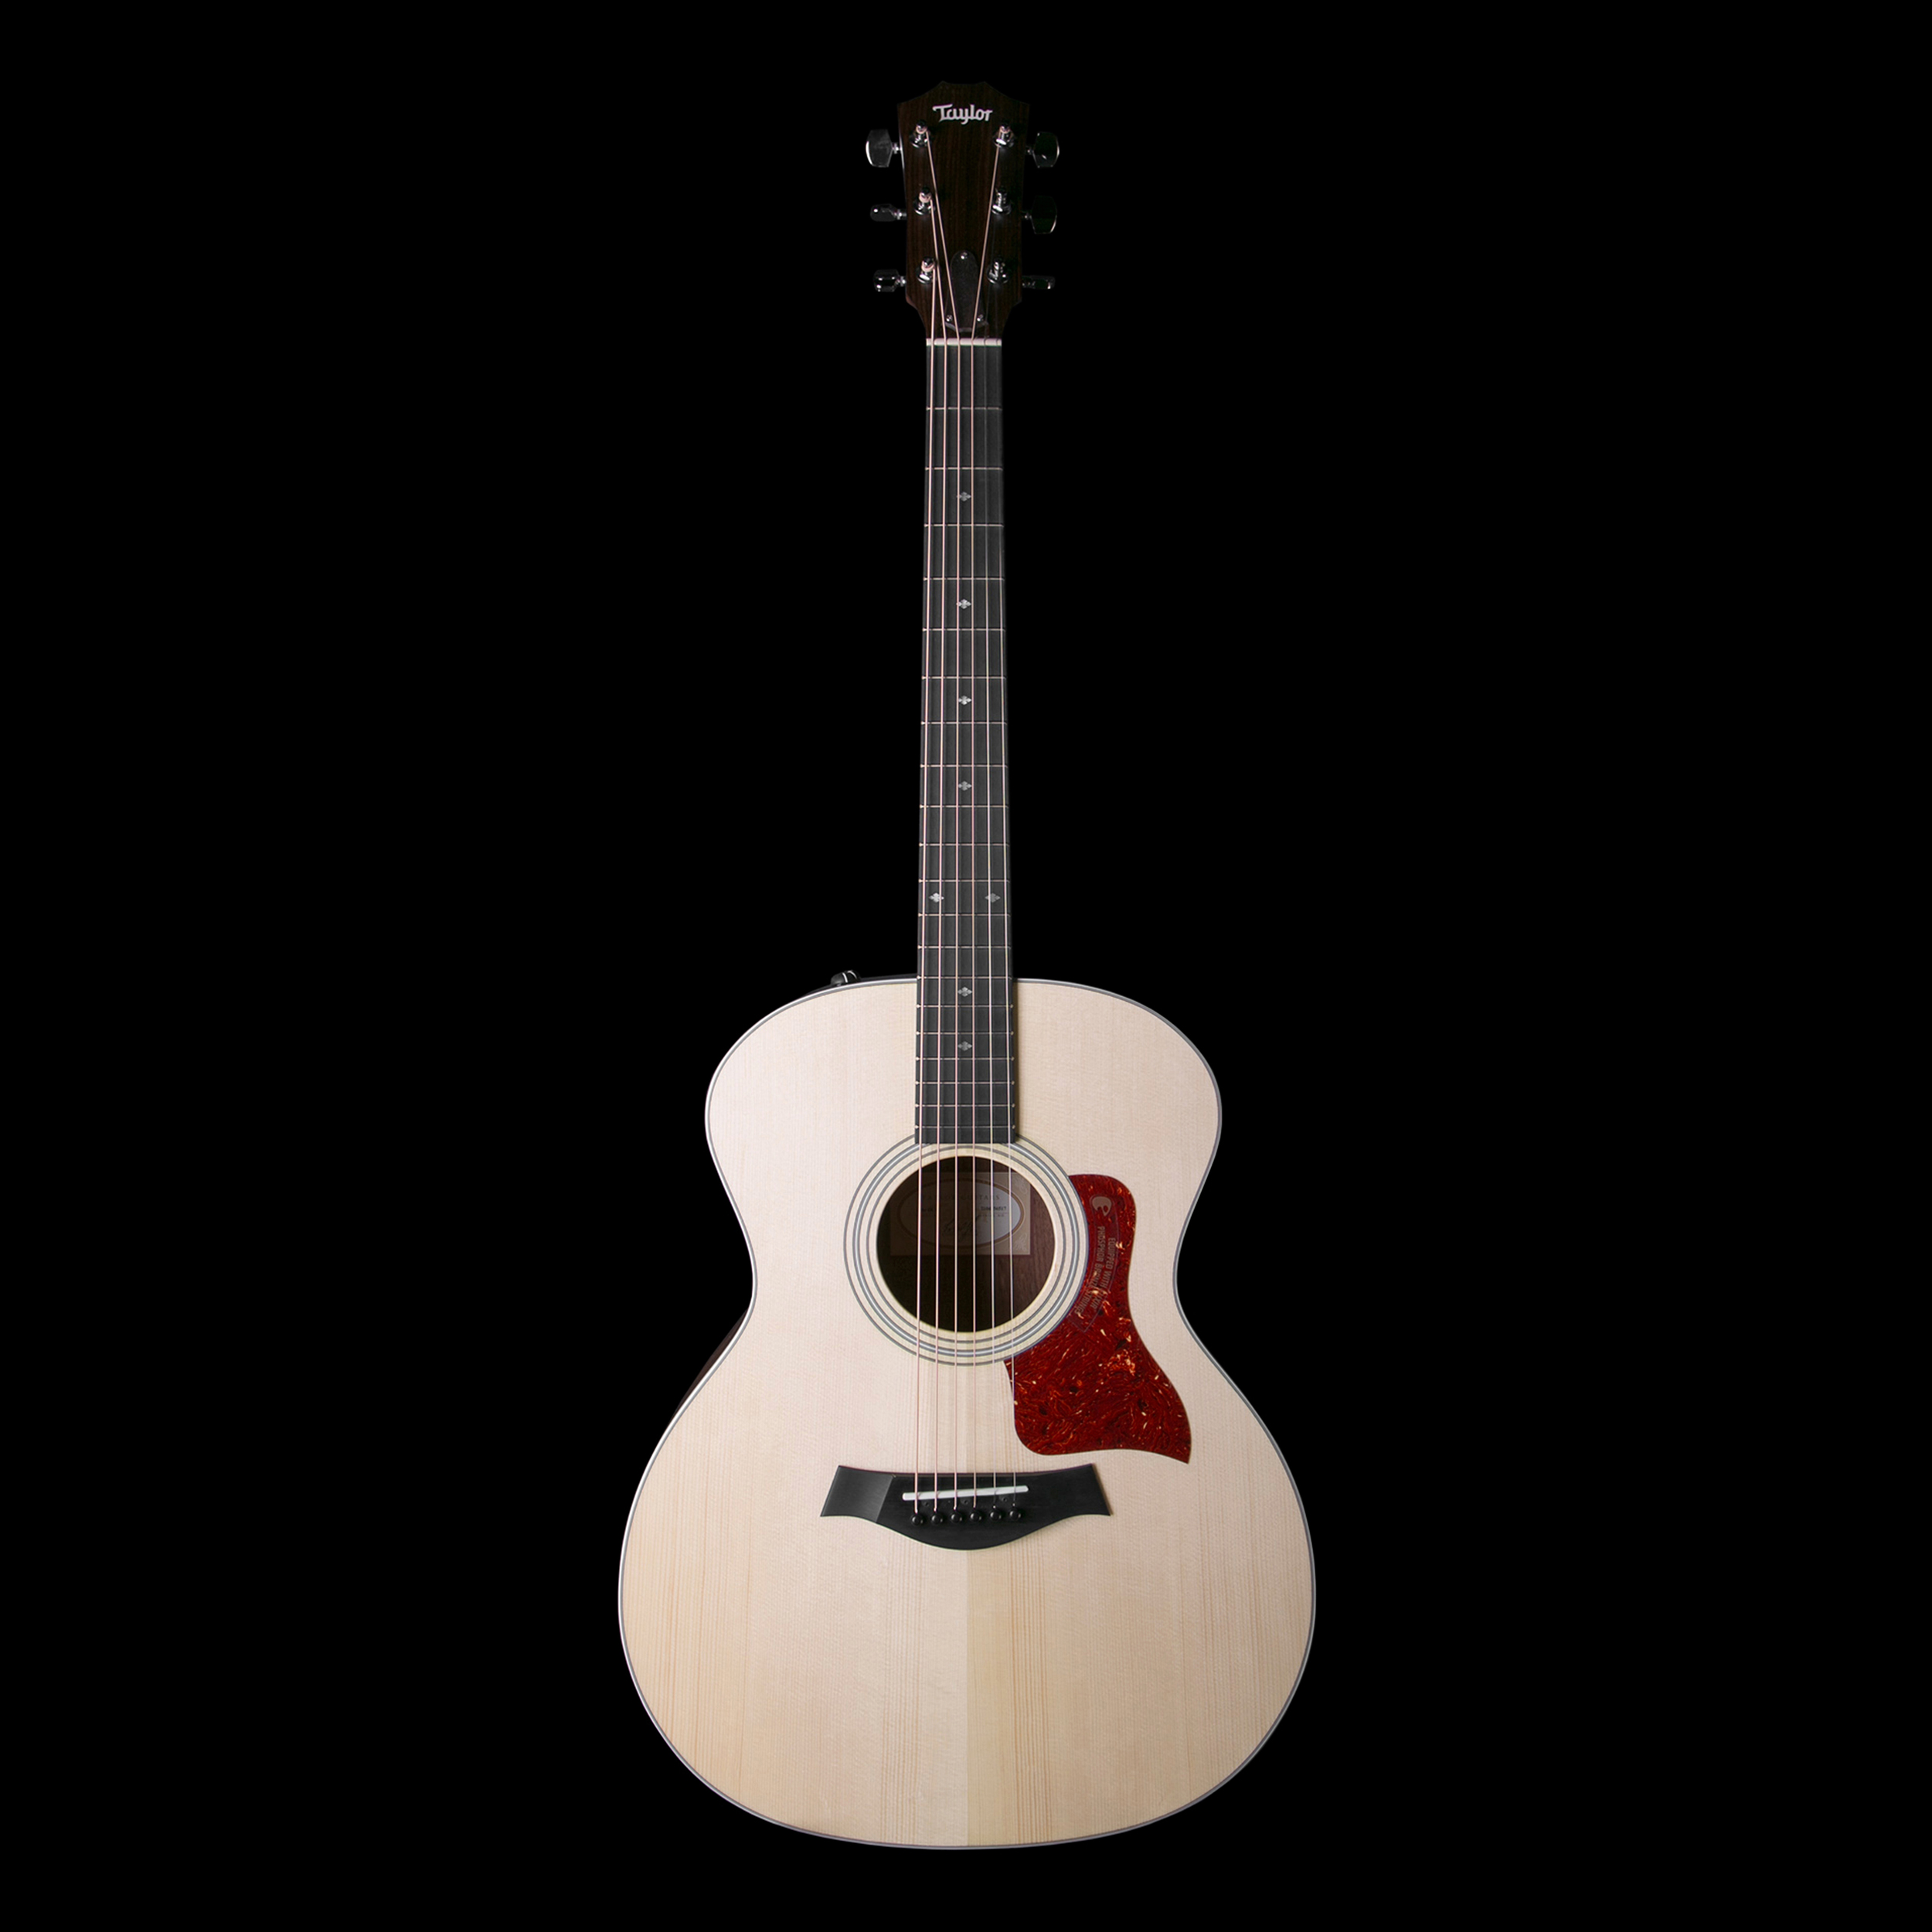 taylor 214e dlx grand auditorium acoustic electric guitar w case ebay. Black Bedroom Furniture Sets. Home Design Ideas